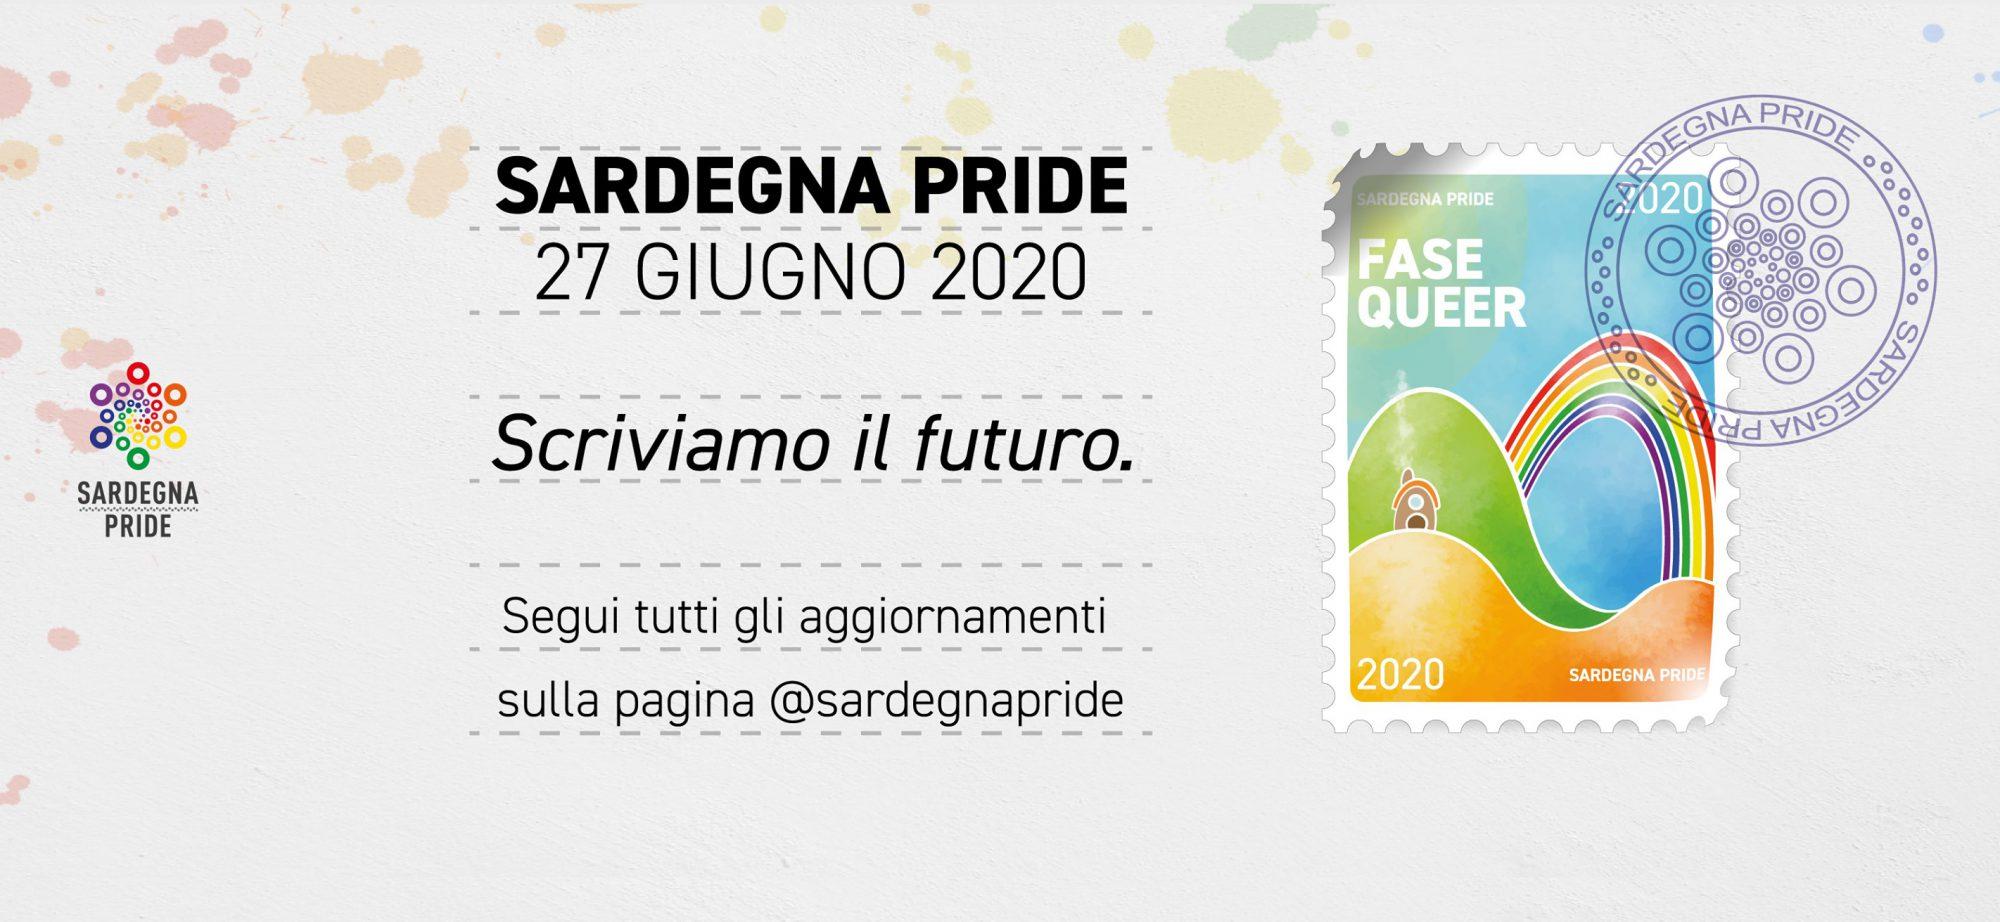 Sardegna Pride 2020